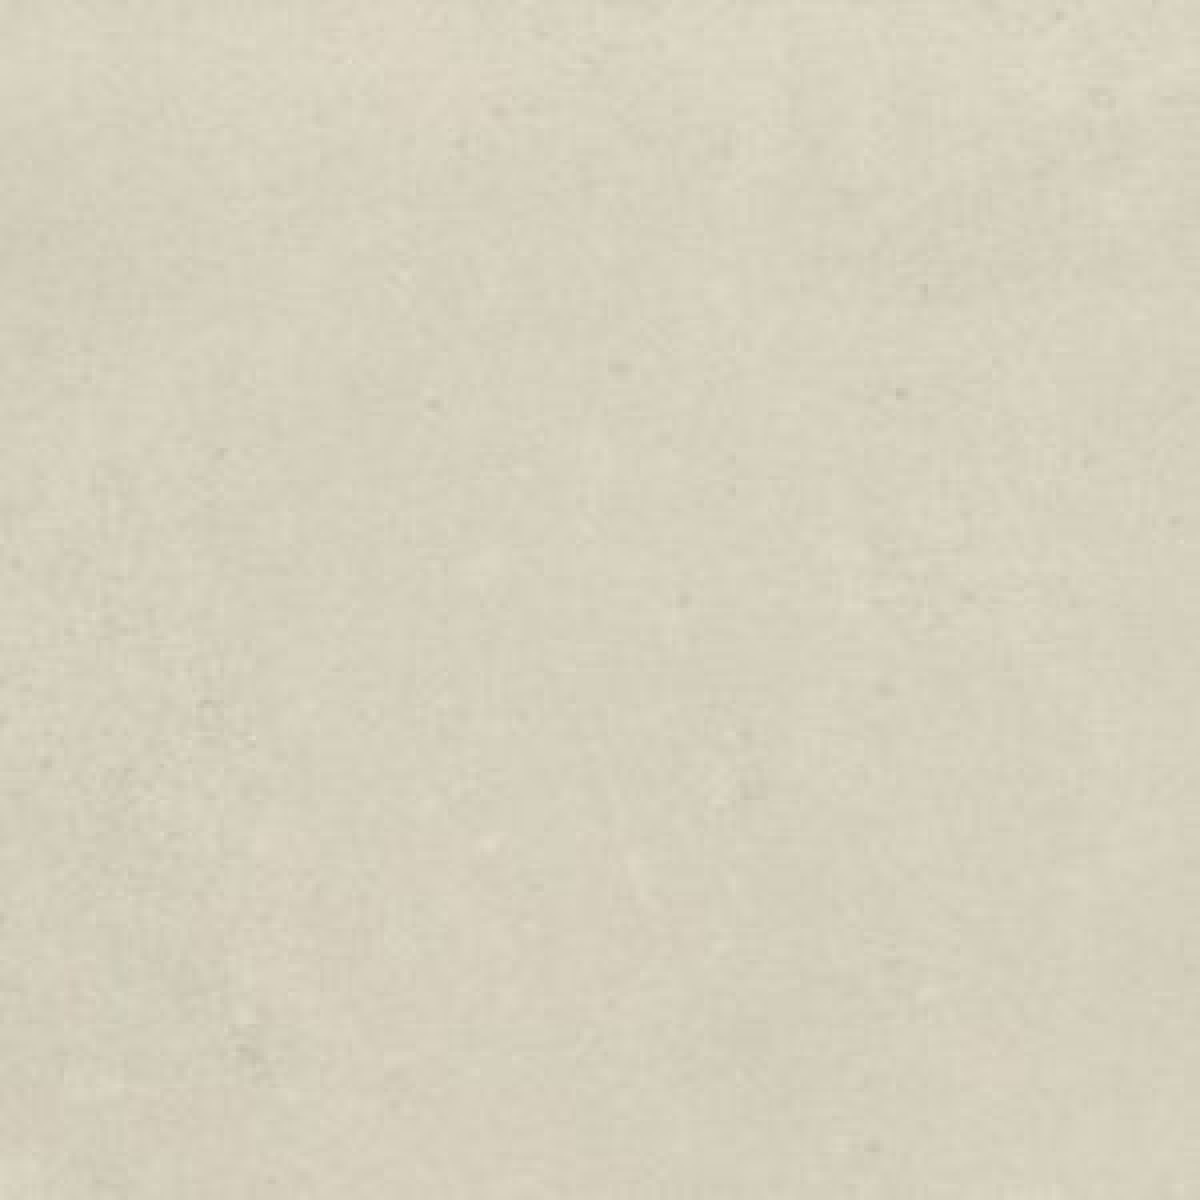 RAK Surface Off White Lappato Tile 600 x 600mm